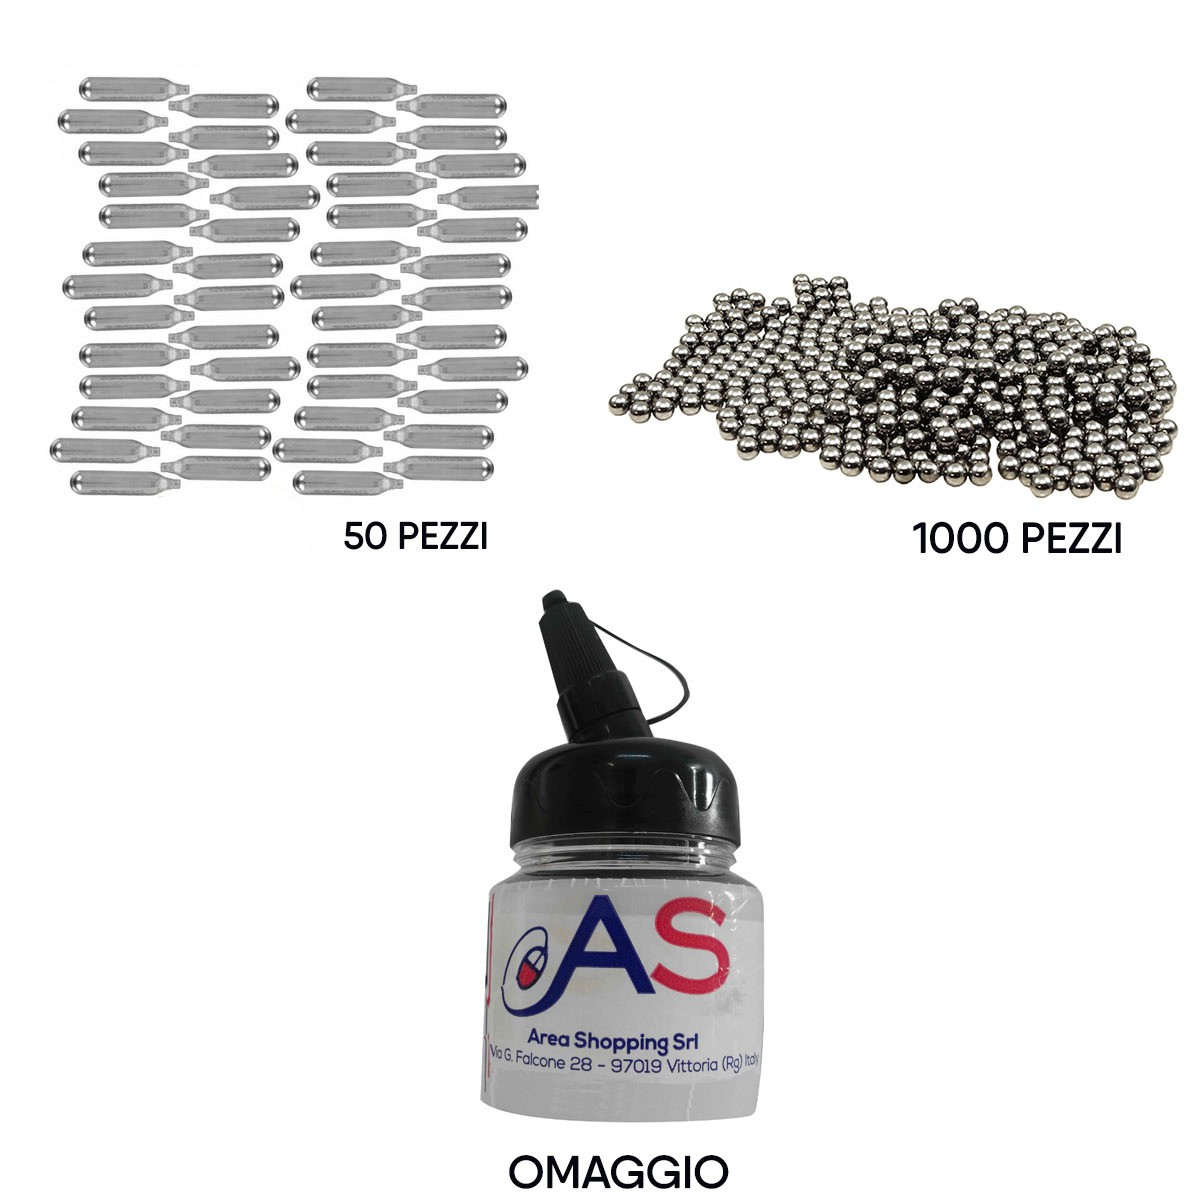 Kit Softair 50 Bombolette CO2 + 1000 Pallini Metallo 6 mm + Barattolo Omaggio